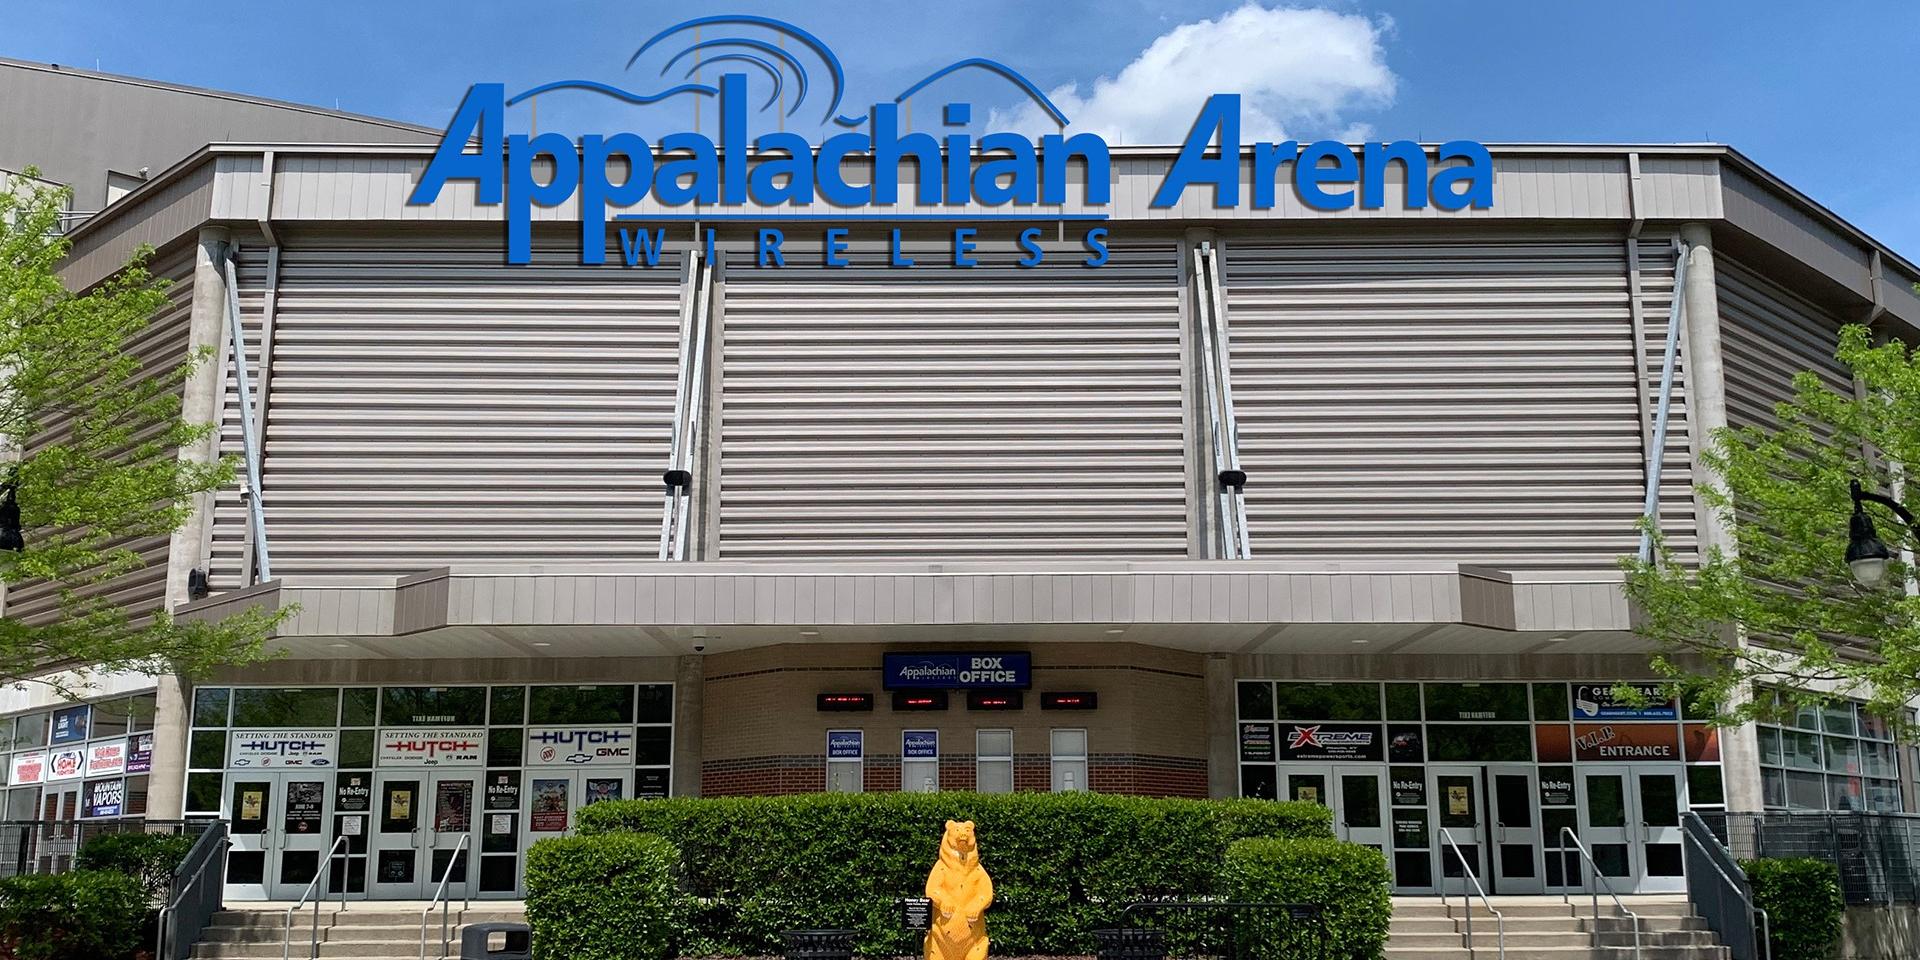 New Name Going Up at Kentucky Arena